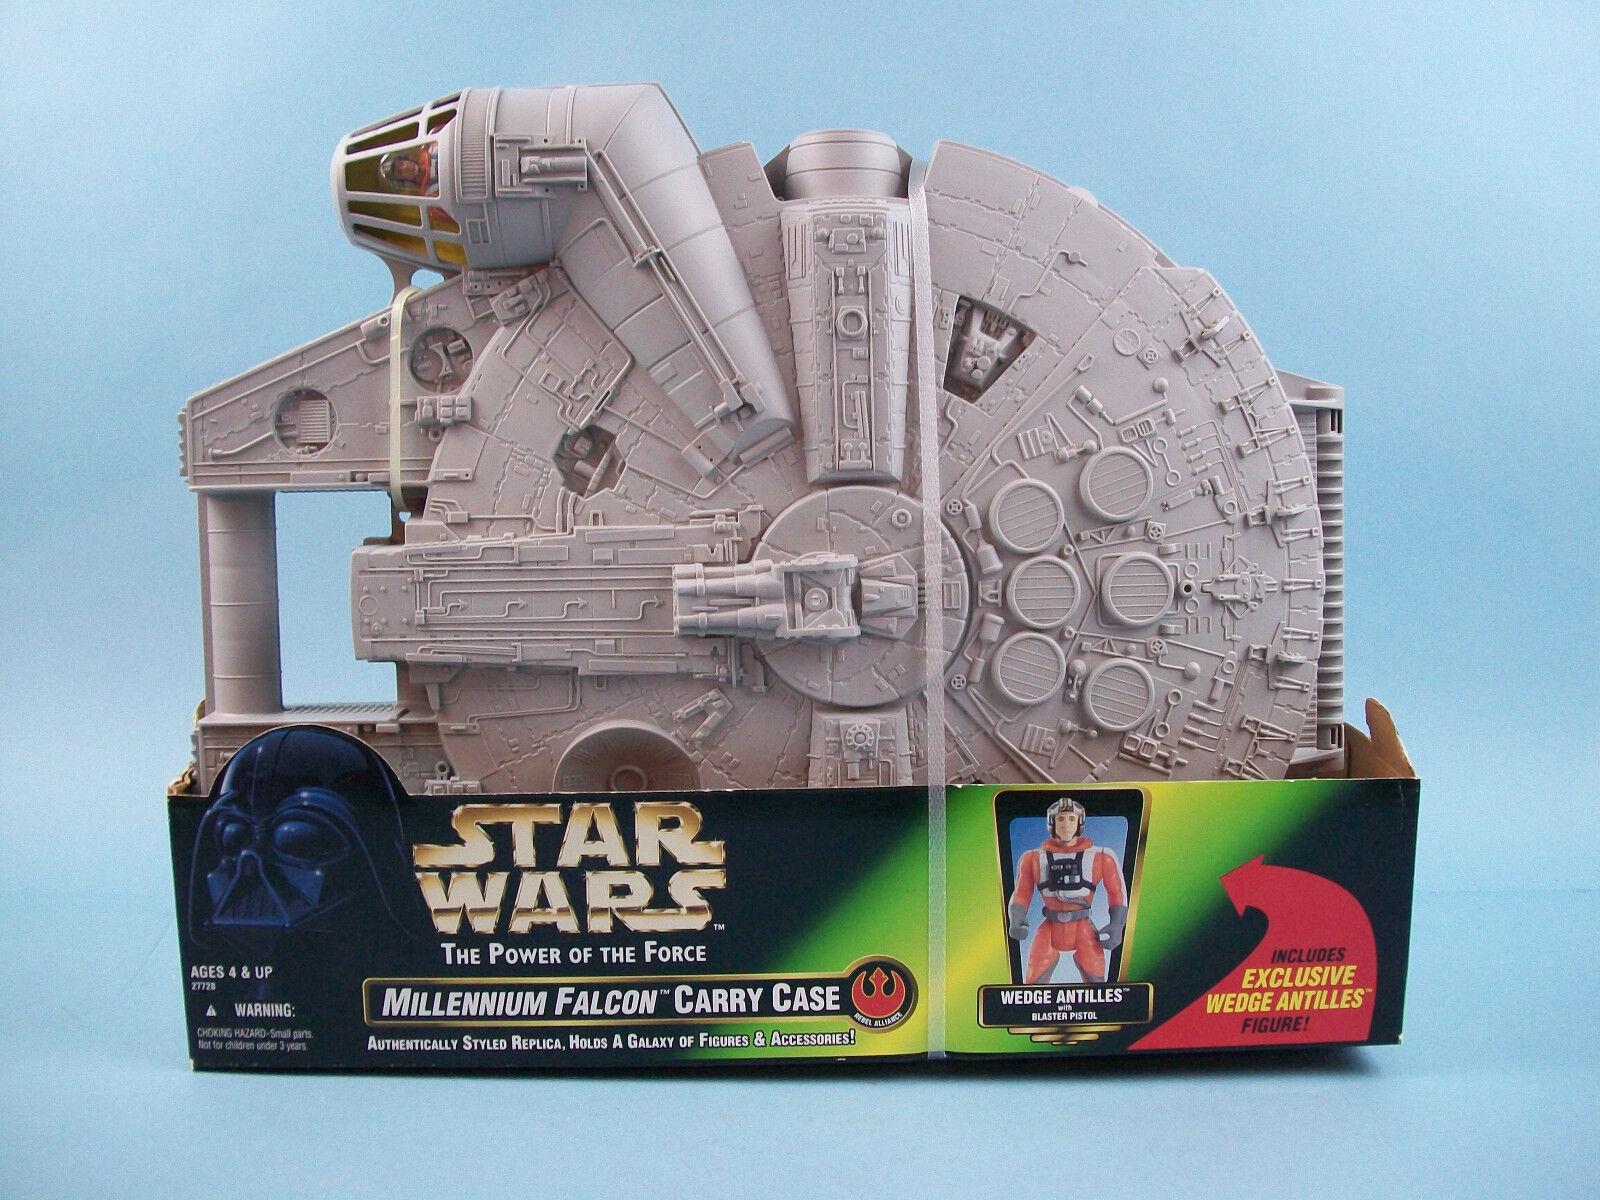 Star wars potf millennium - falken transportbox w   keil antillen abbildung kenner